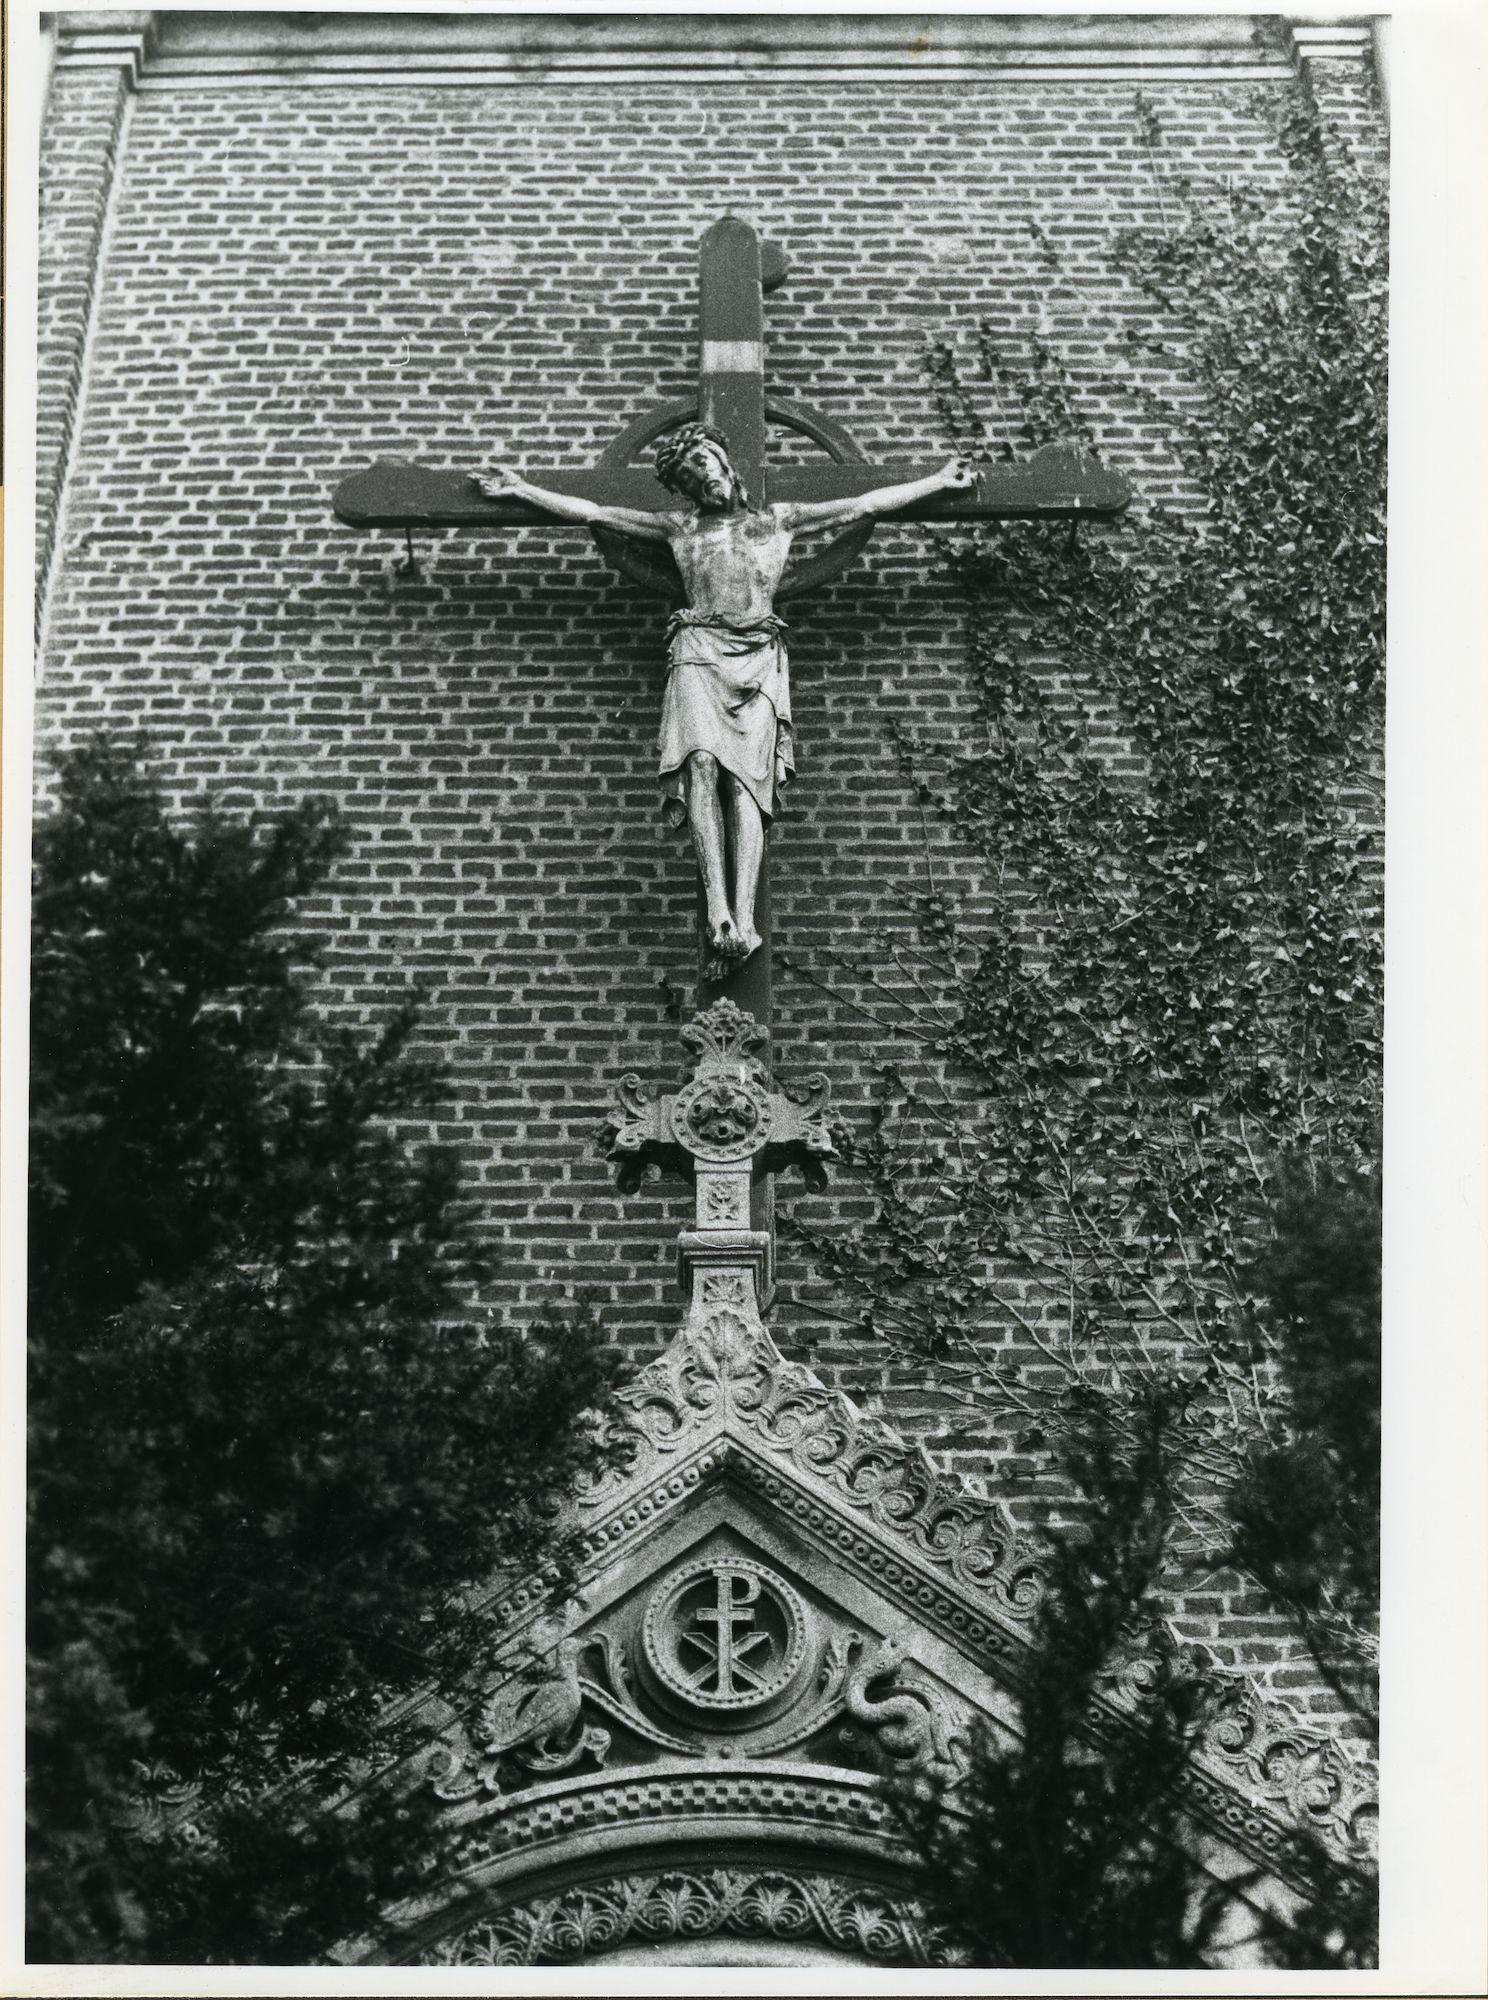 Sint-Amandsberg: Antwerpsesteenweg: Kruisbeeld